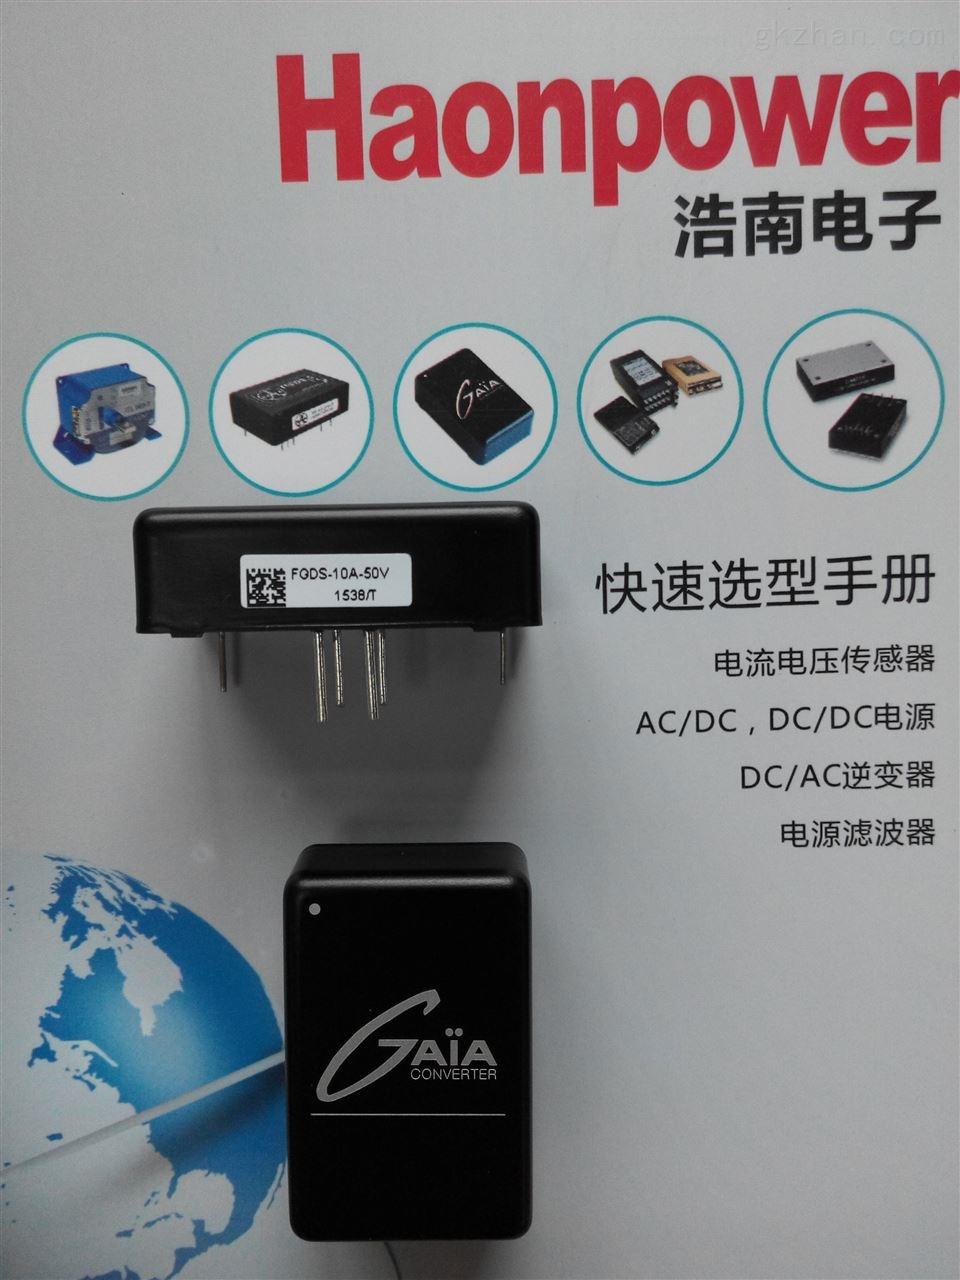 GAIA直流电源输入滤波器FGDS-10A-50V